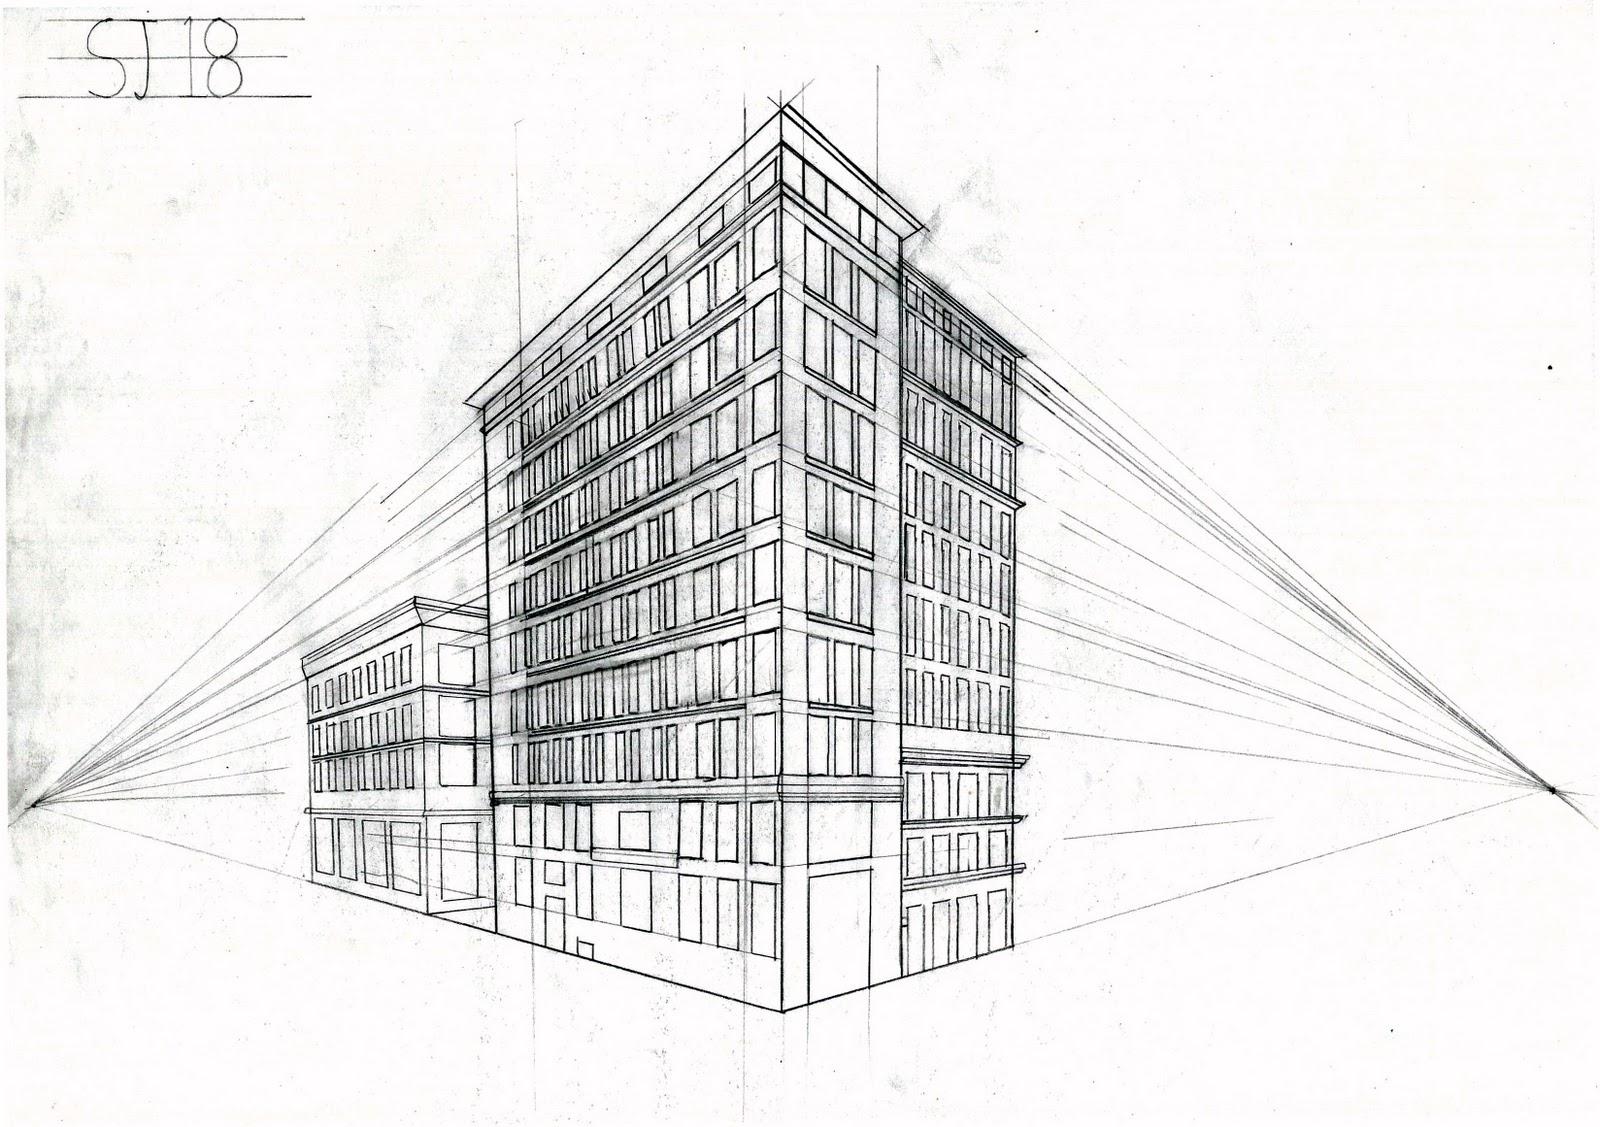 Teddy Amp Architecture Sj 18